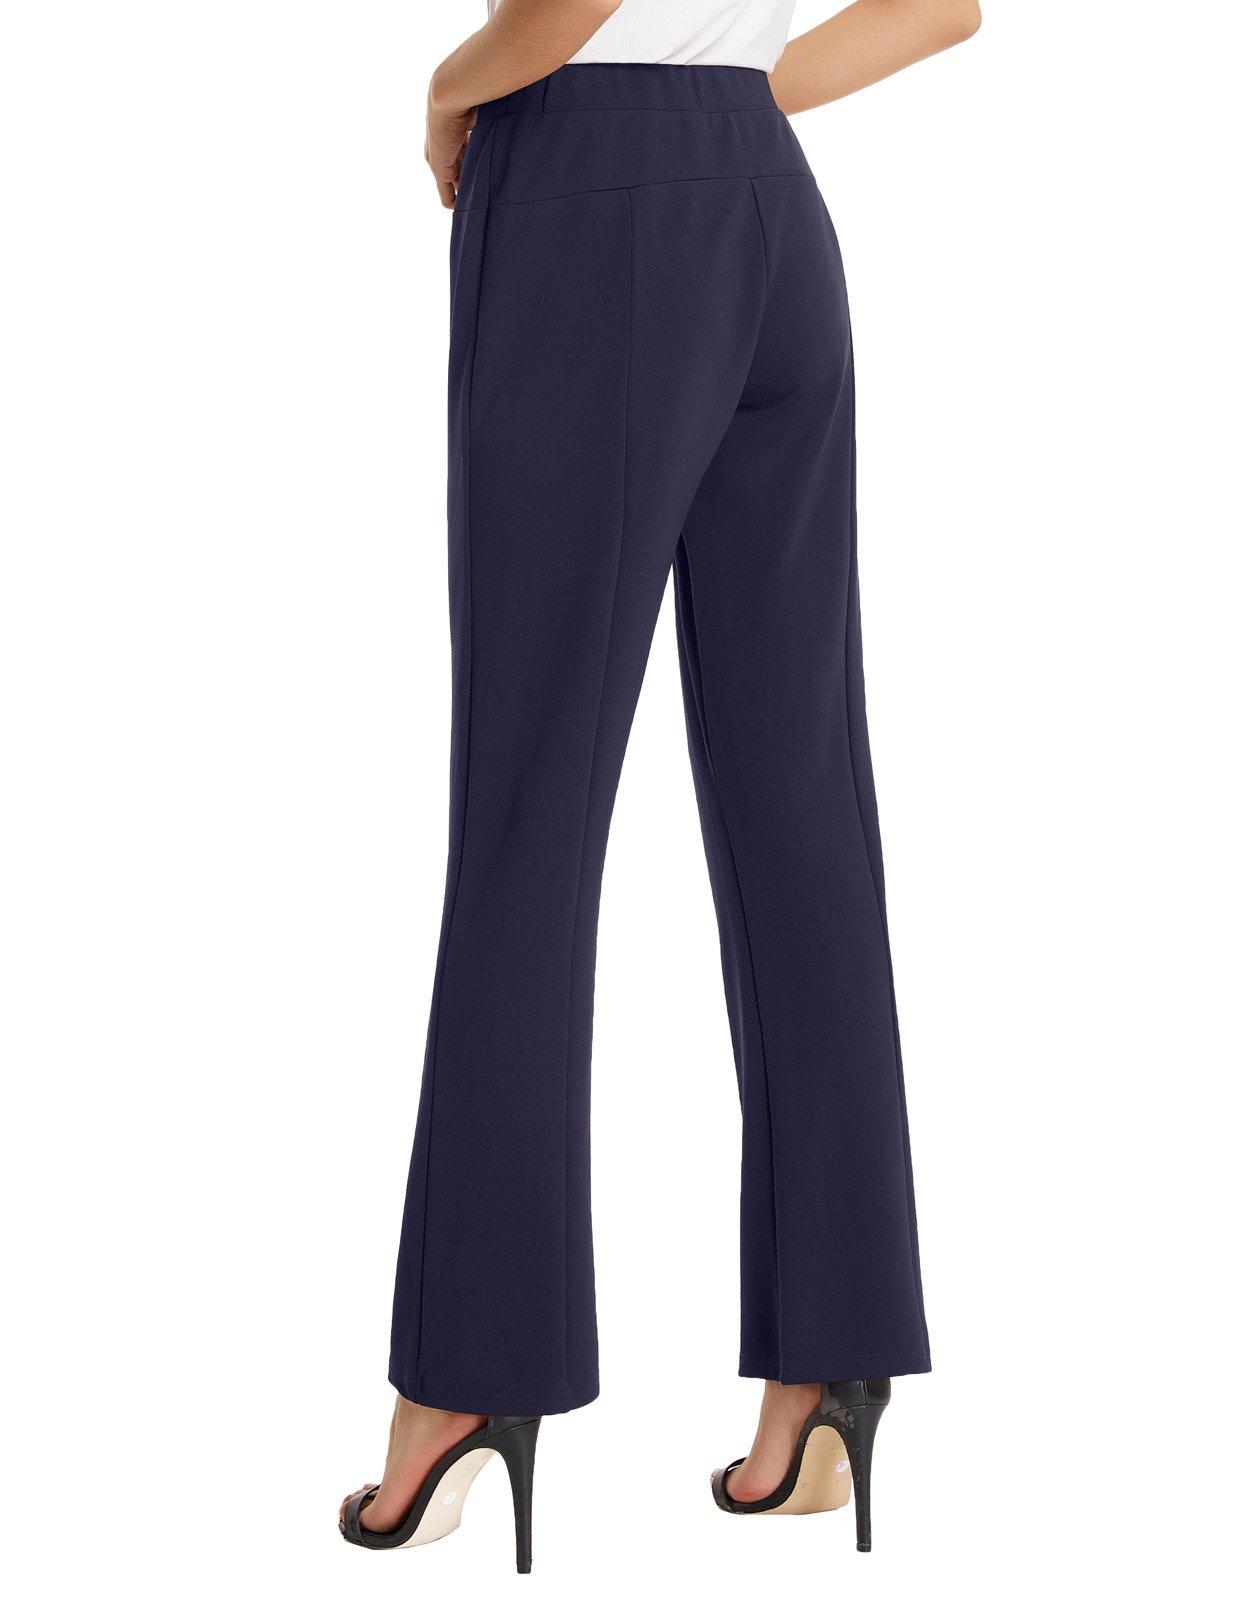 Kate Kasin Womens Elastic Straight Leg Bootcut Trousers Pants L KKAF1018-2 by Kate Kasin (Image #2)